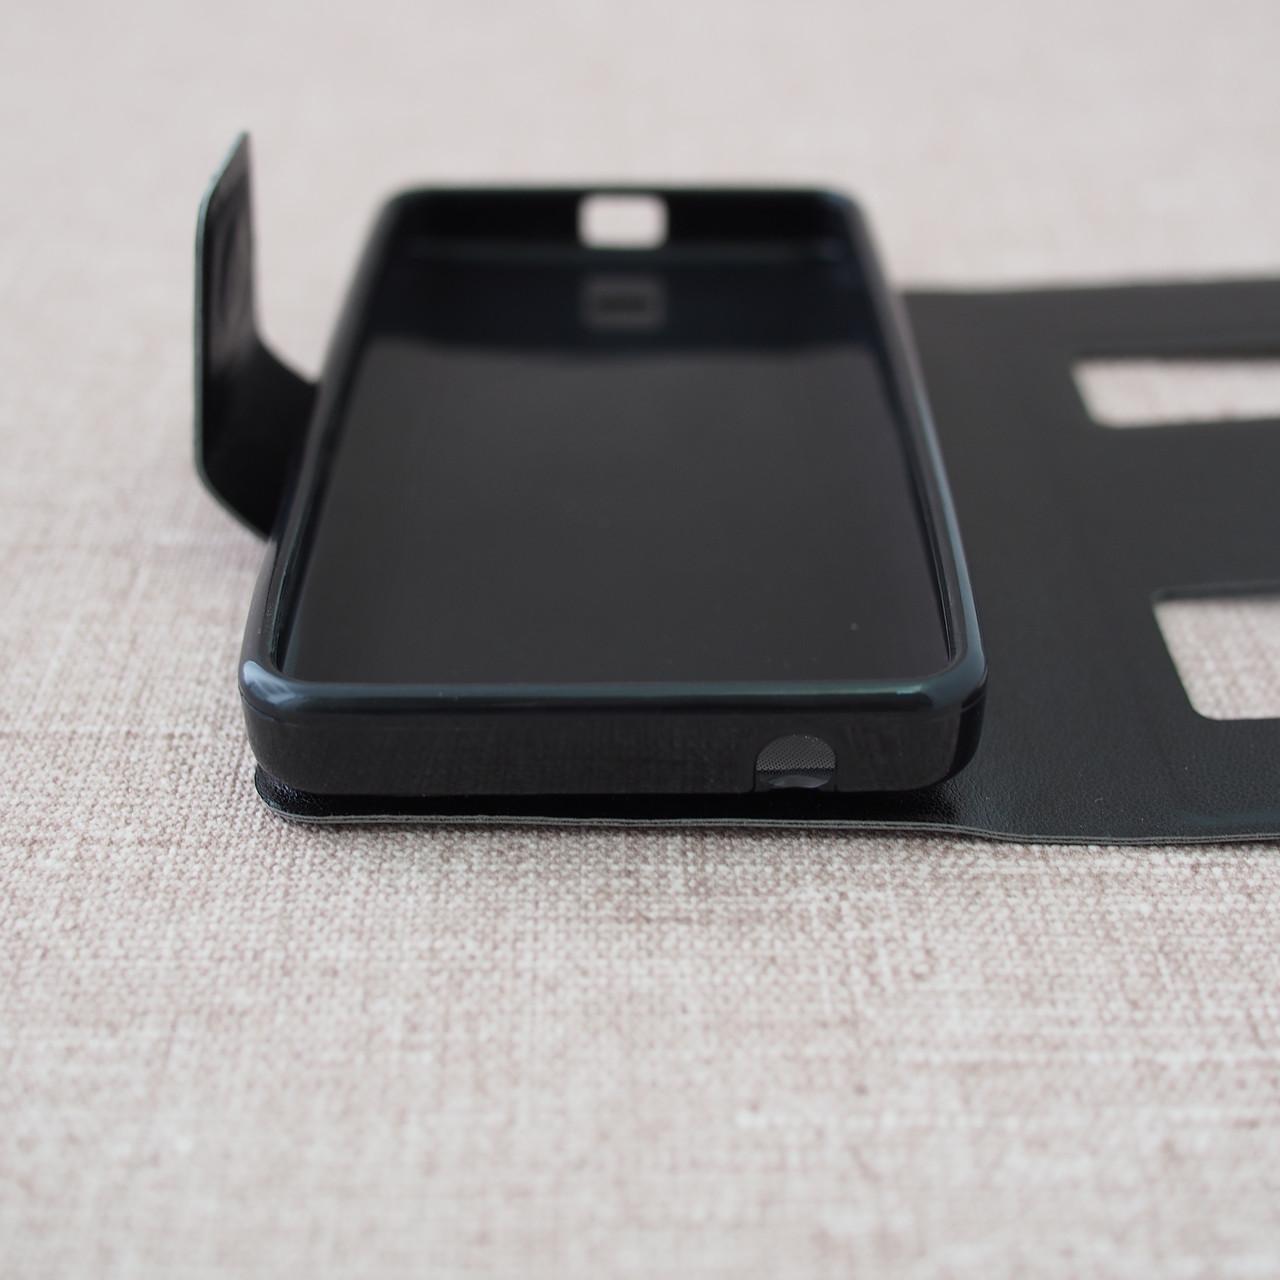 Book Cover Microsoft 430 black Для телефона Черный